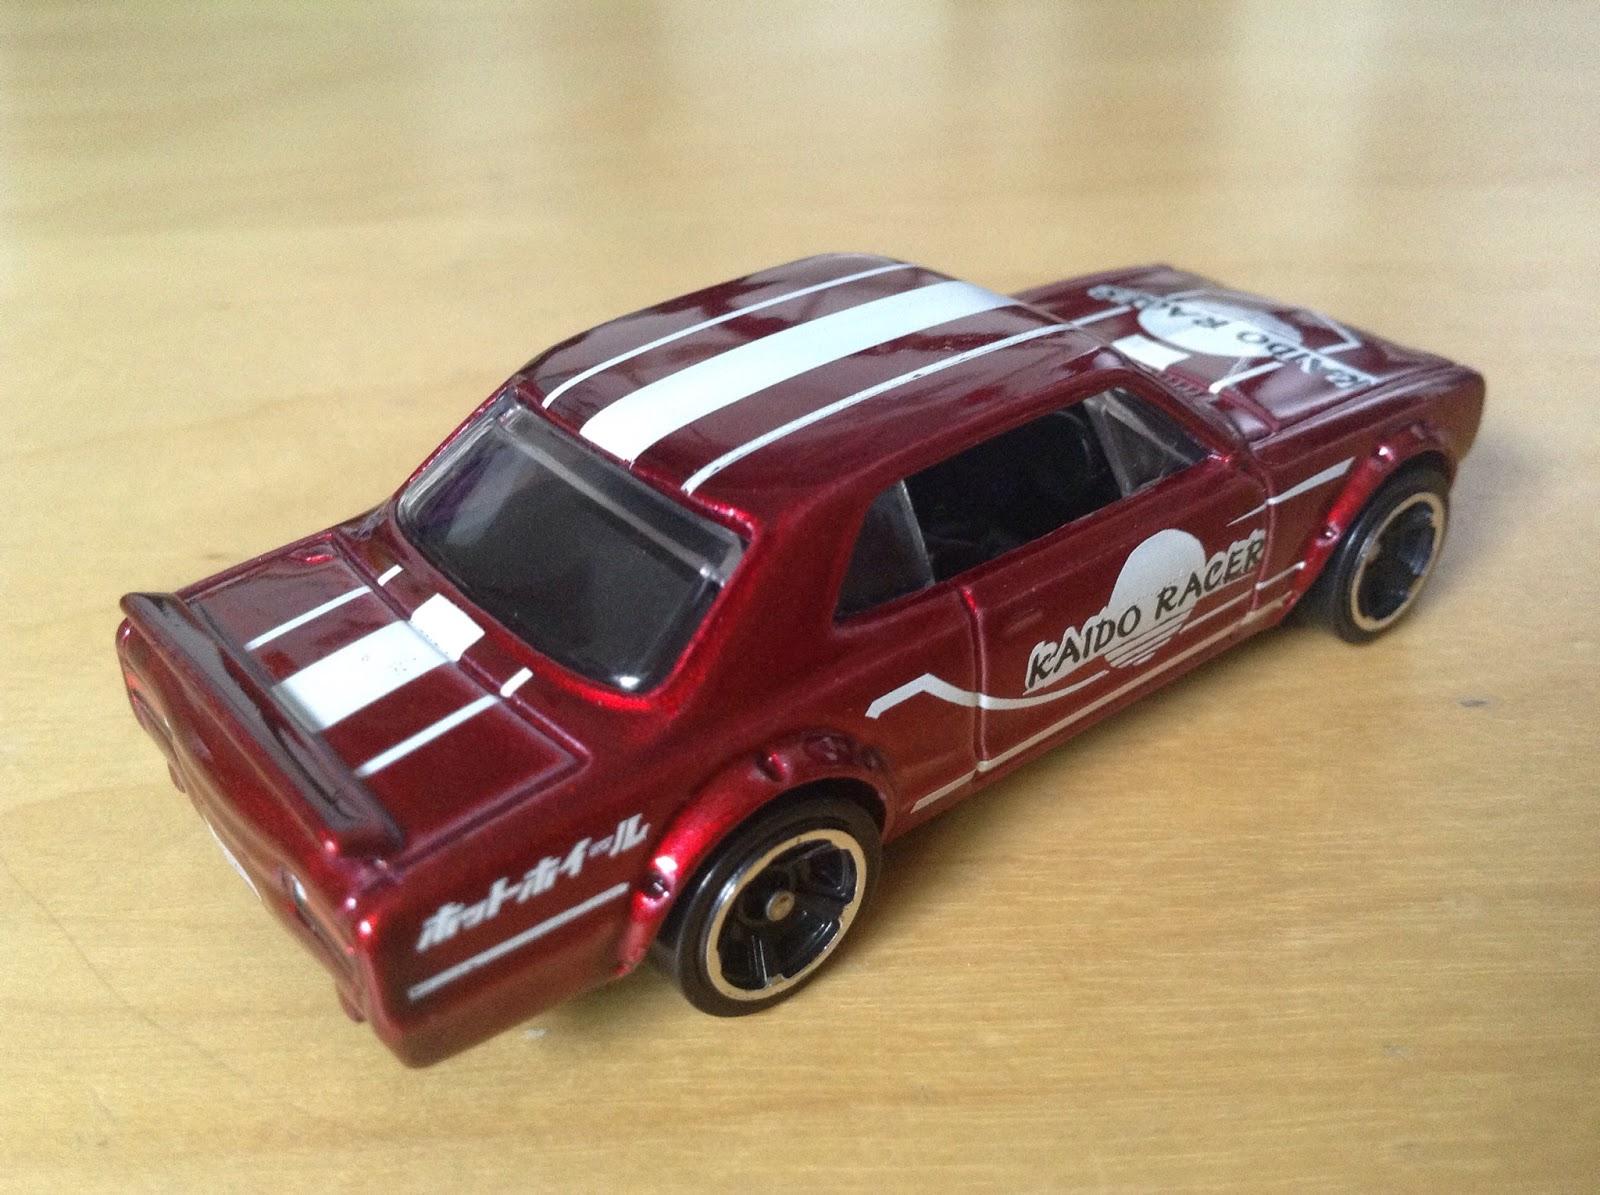 Nissan Skyline H/T 2000 GT-X (Kaido Racer) - 2015 HW Road Trippin': Mt. Fuji Touge Road (Walmart Exclusive)